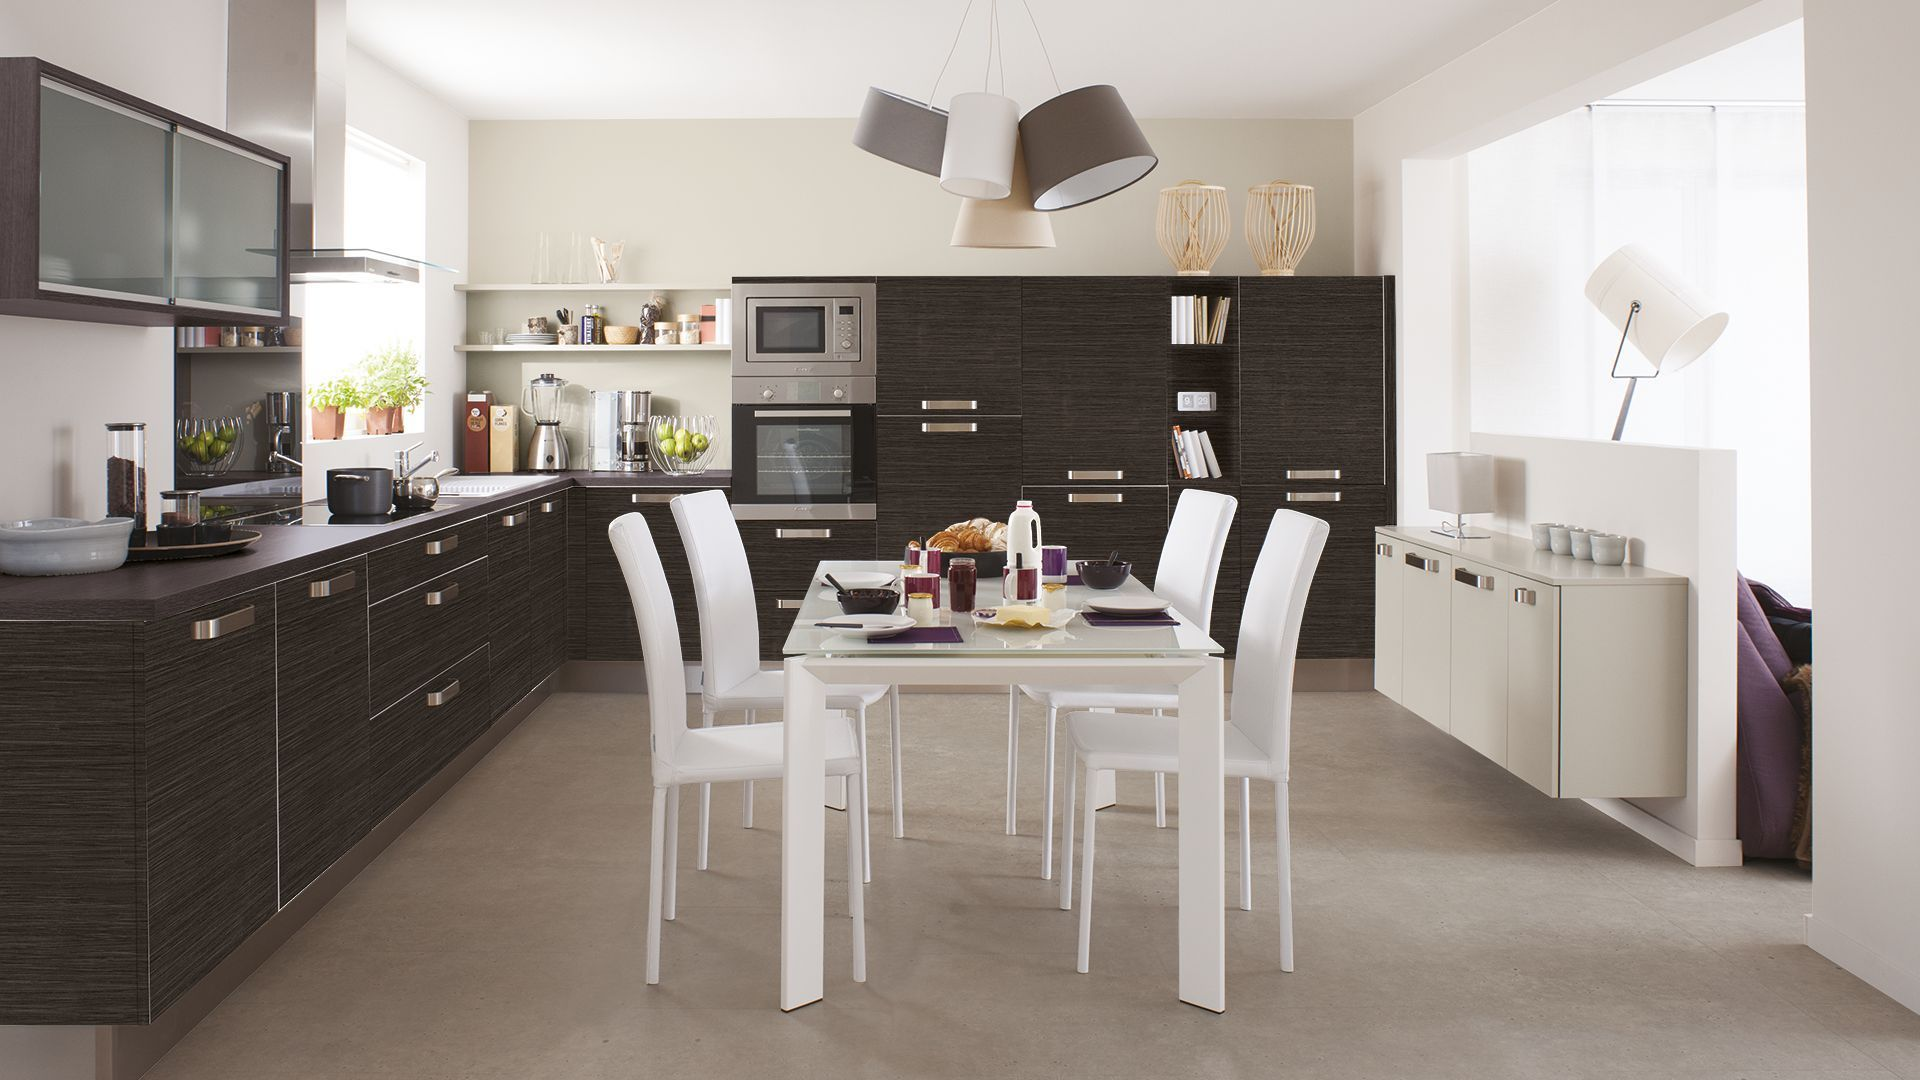 great cuisine noirblanc mur chocolat home u more pinterest cuisine design cuisine and house with. Black Bedroom Furniture Sets. Home Design Ideas